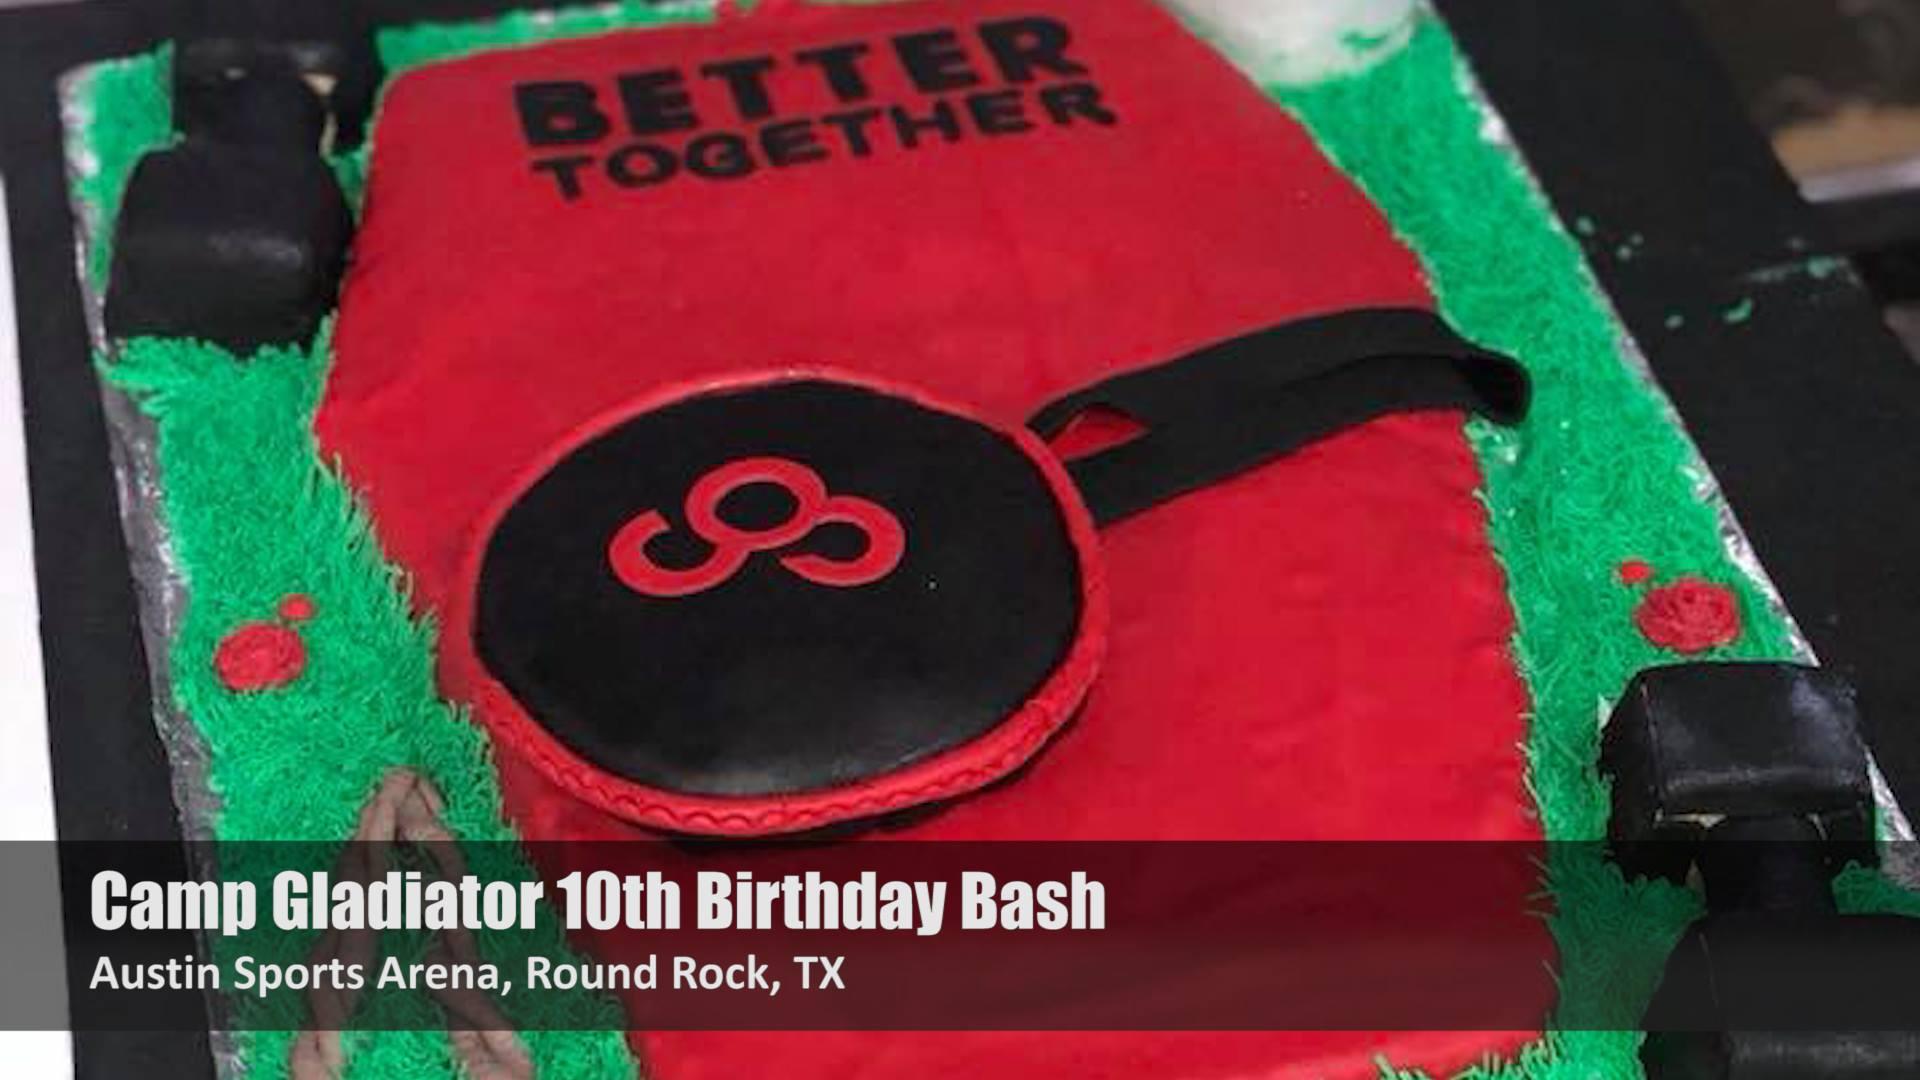 CG Super Saturday Birthday Bash (09/15/18)